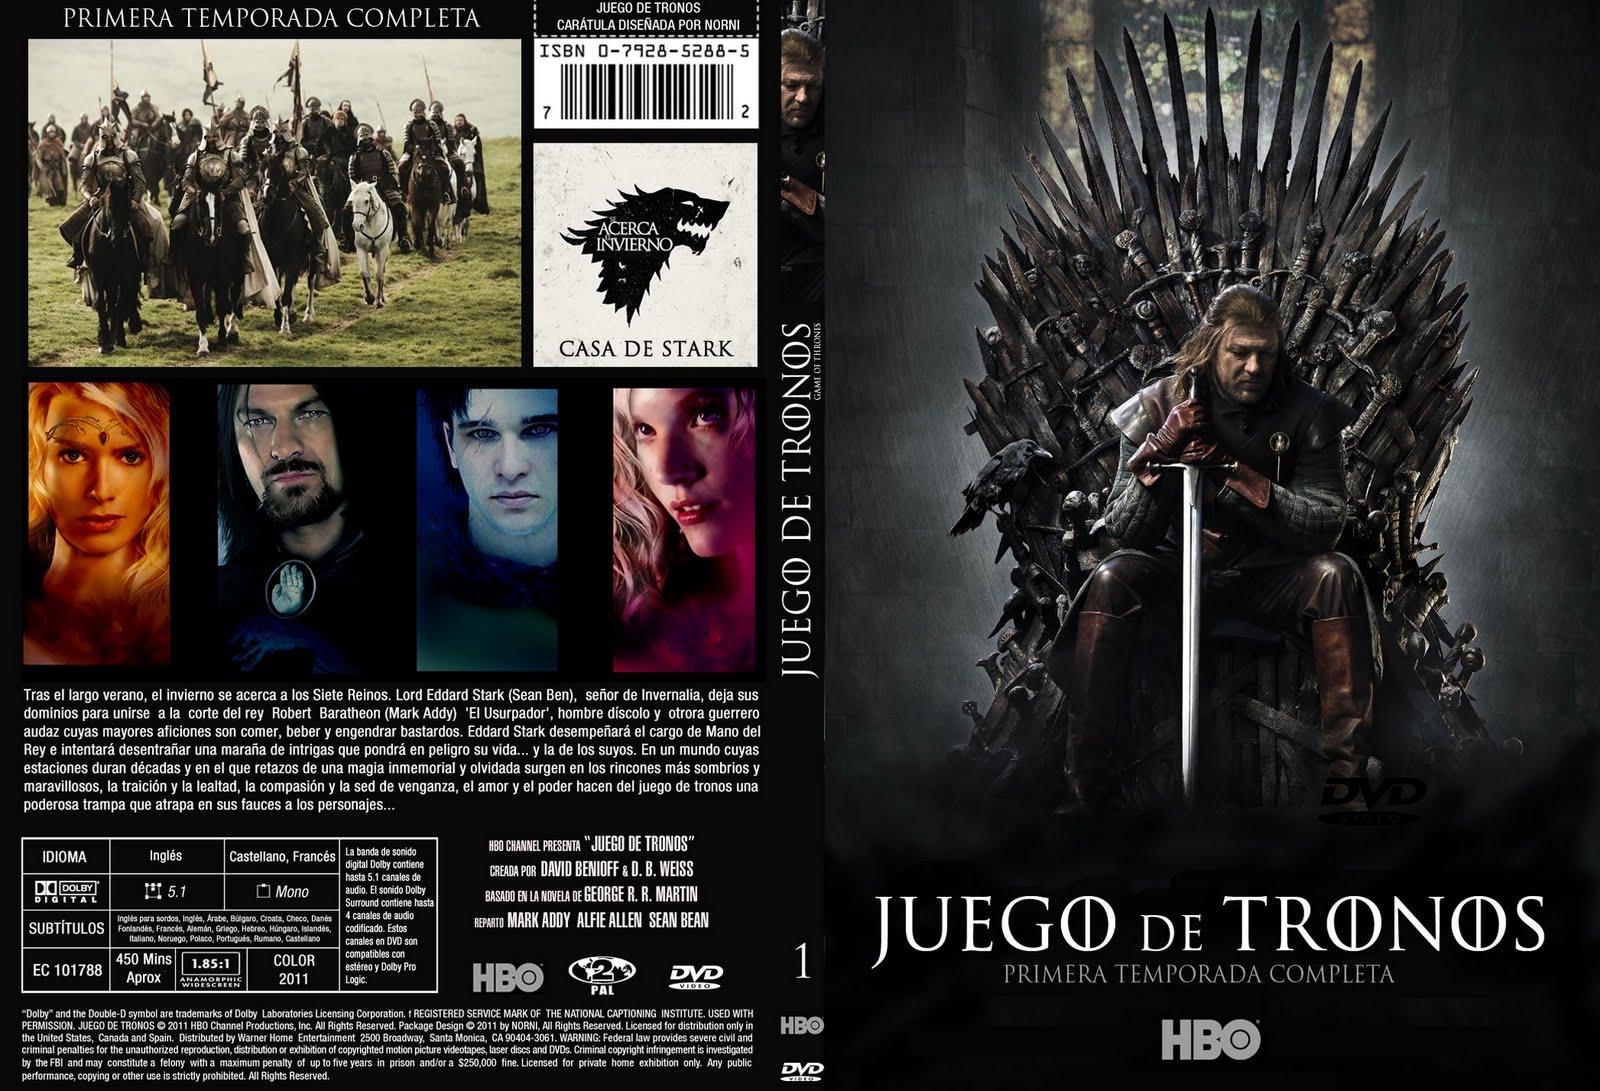 Juego de tronos 4 temporada series pepito : Que paso ayer parte 3 ...